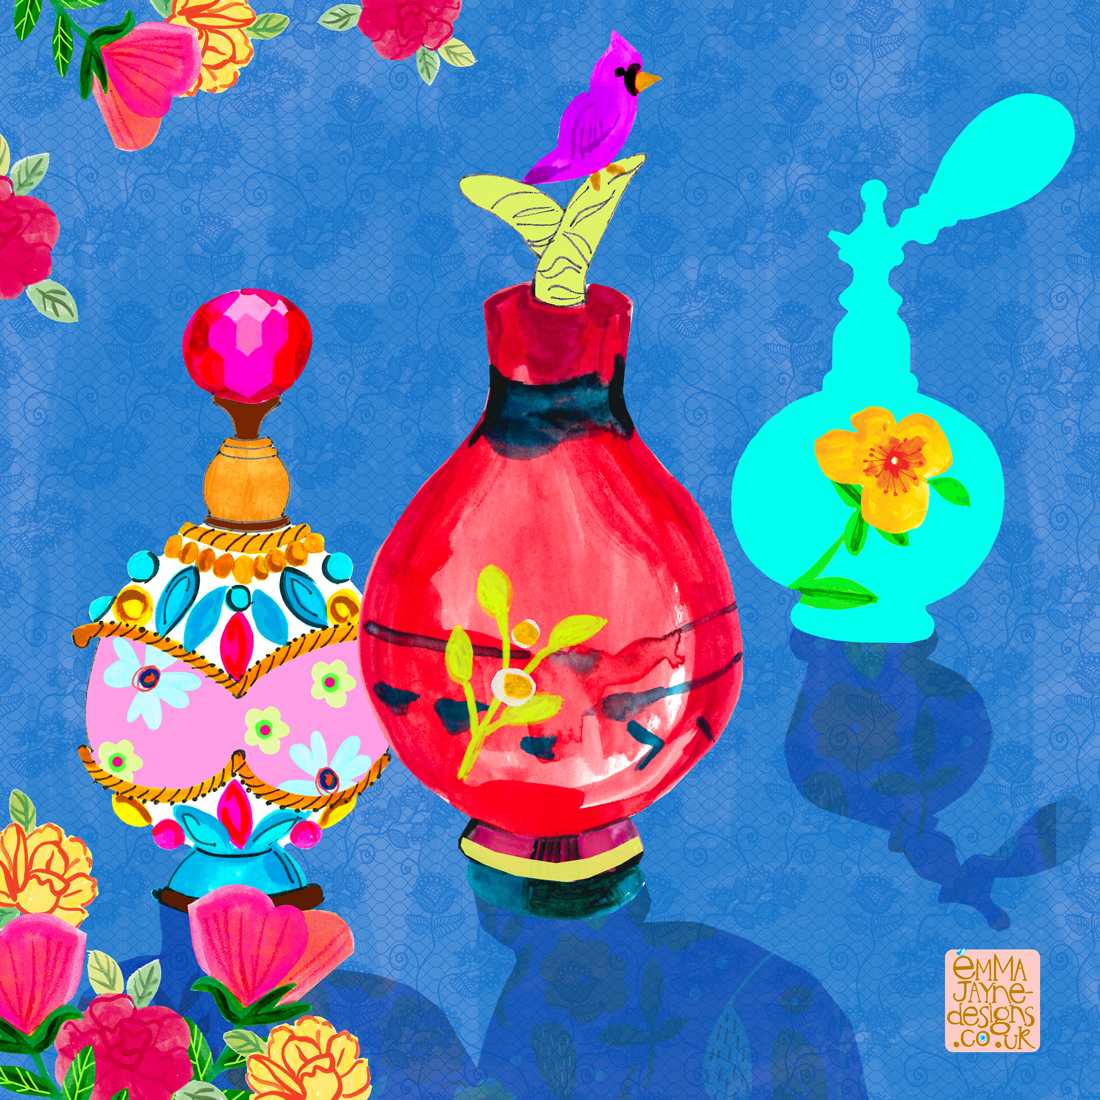 floral-perfume-card-set3-emmajayne-designs